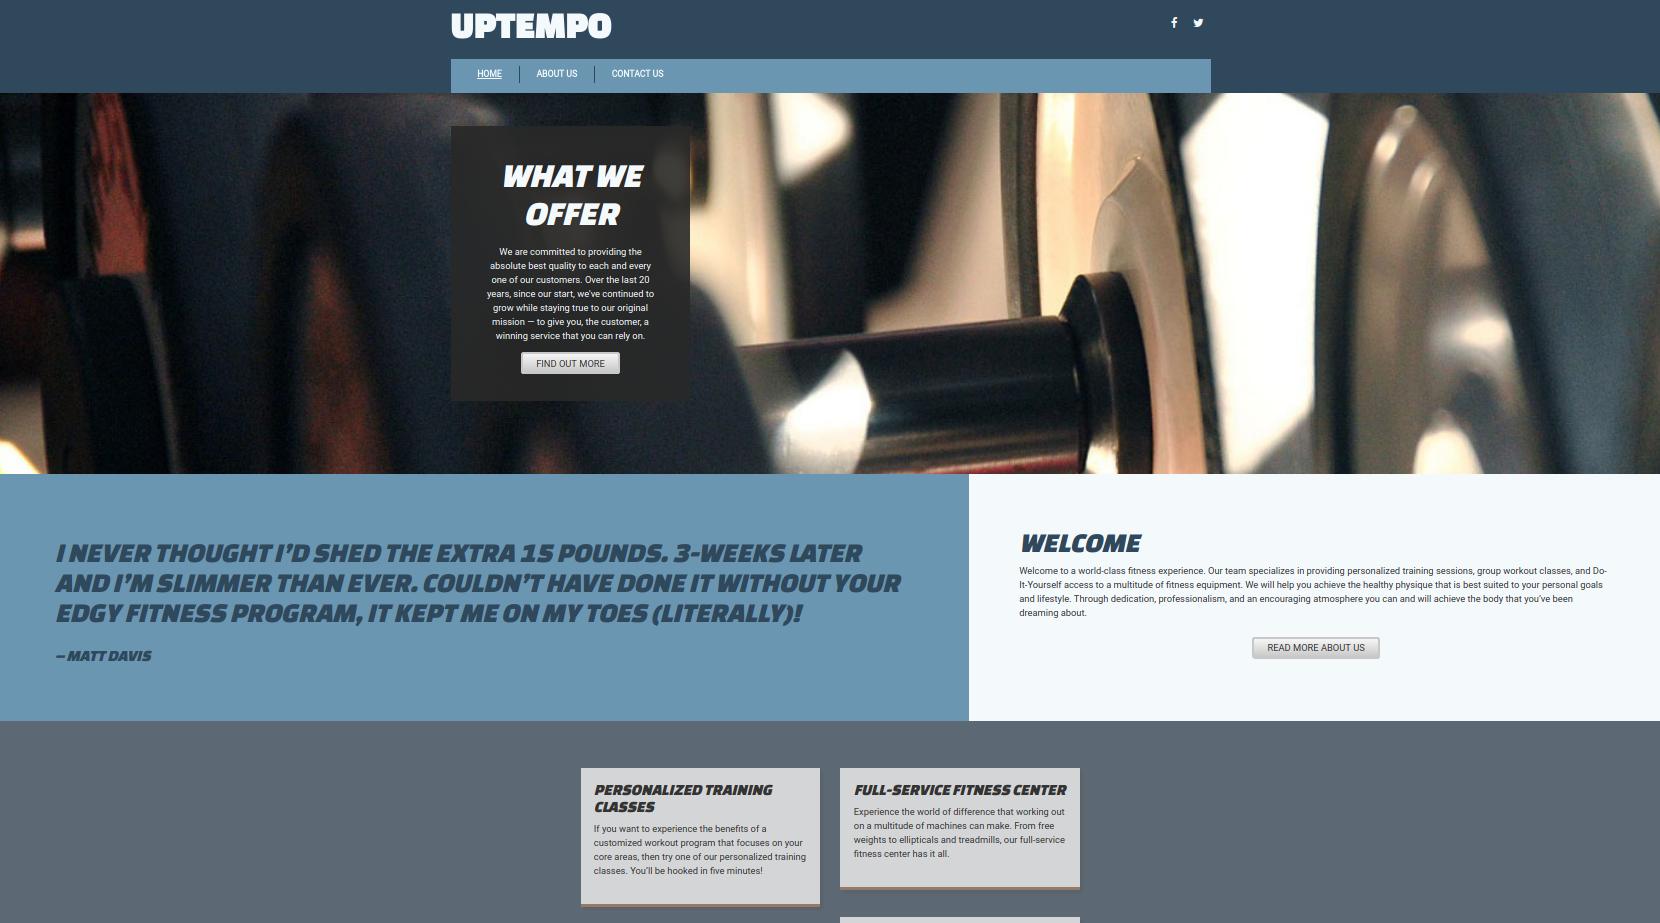 Uptempo Theme Screenshot